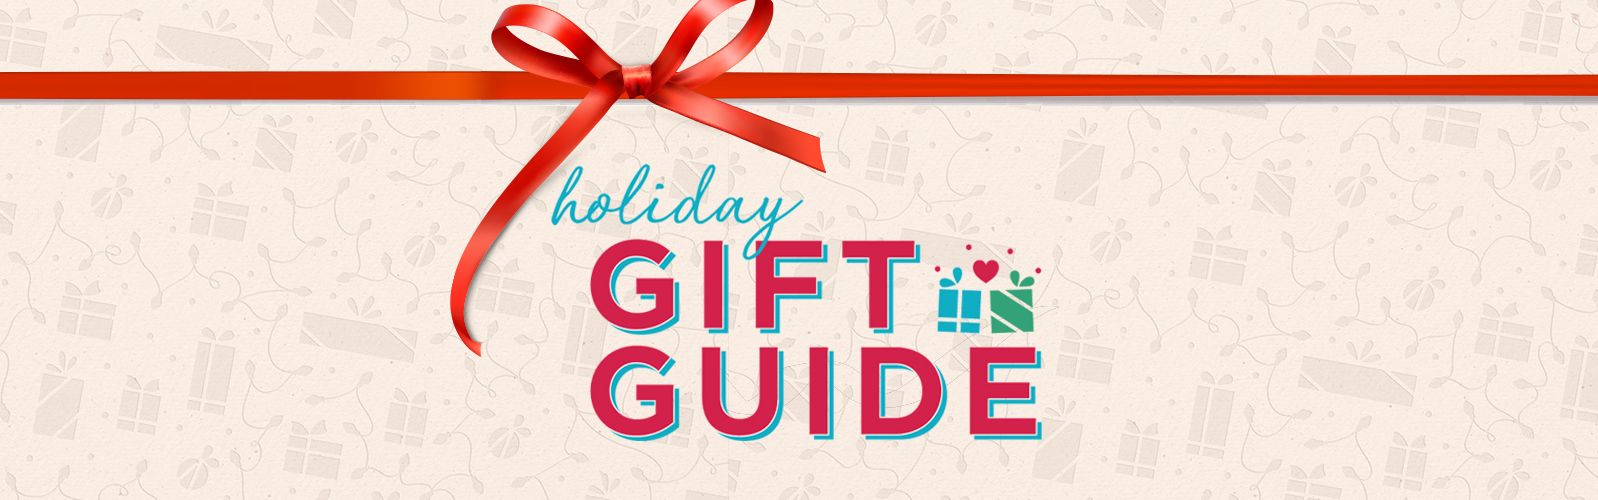 Apple 12 days christmas gift list